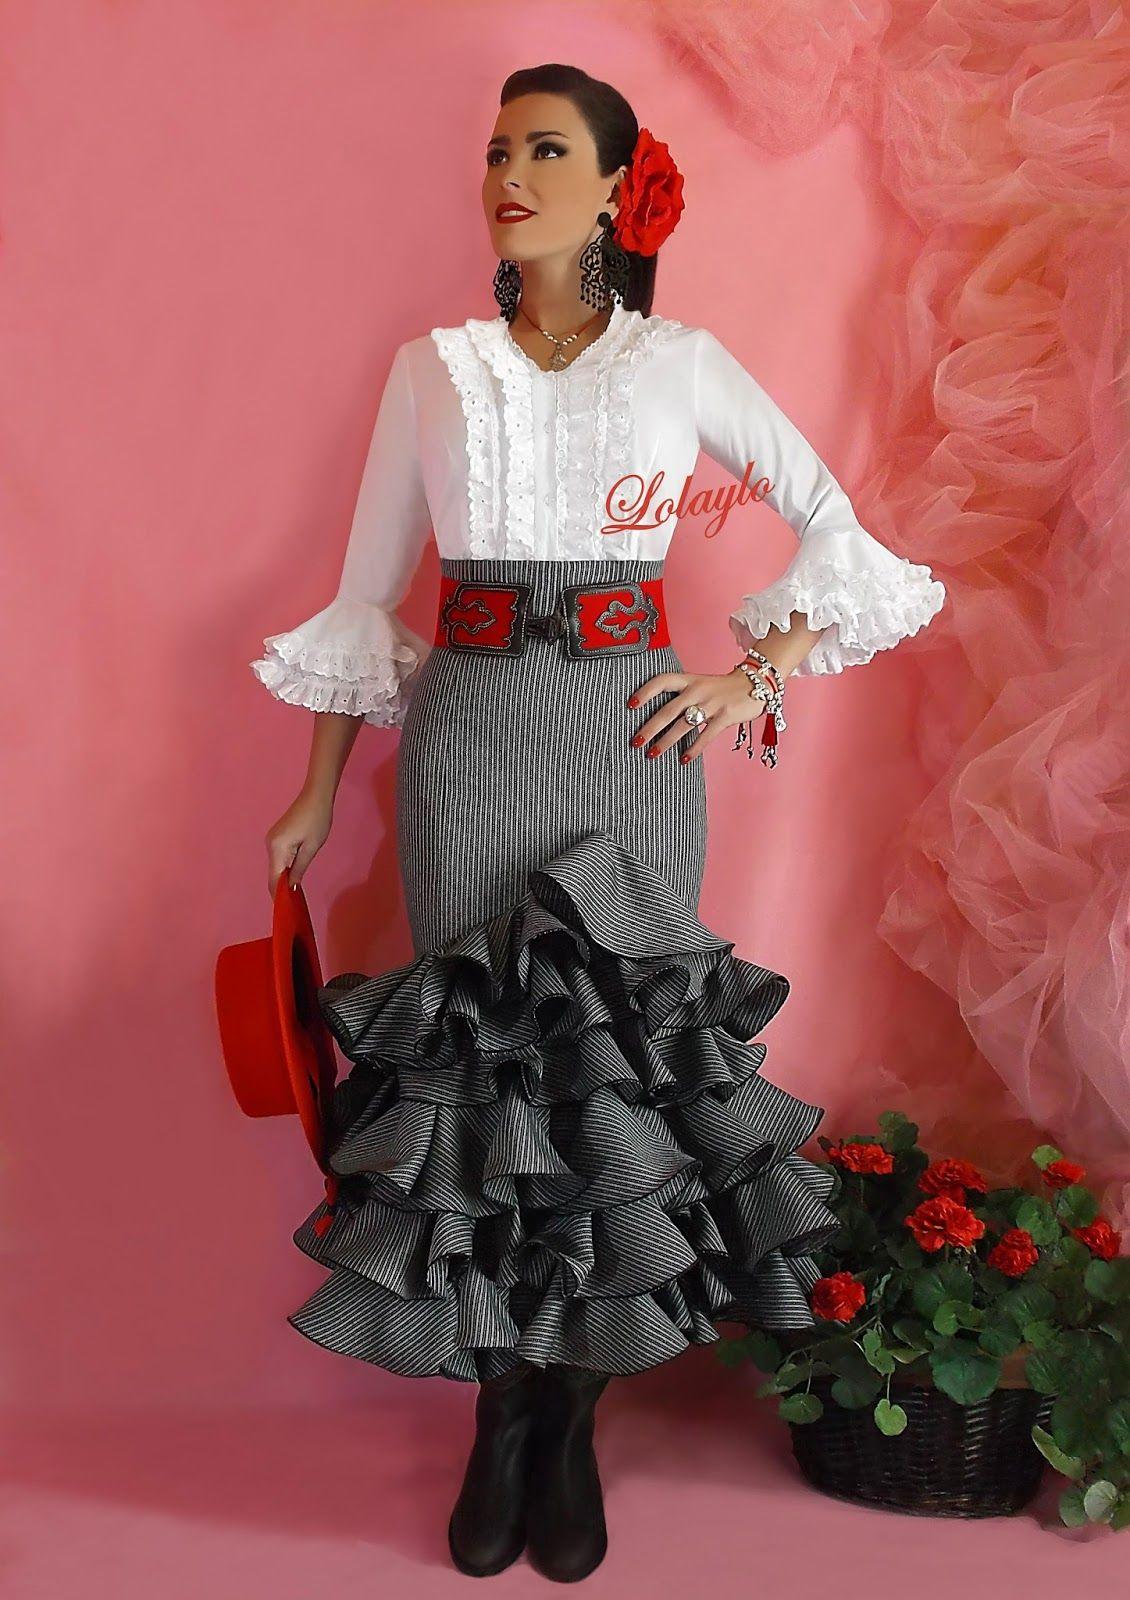 Edumer Trajes de Flamenca | Facebook